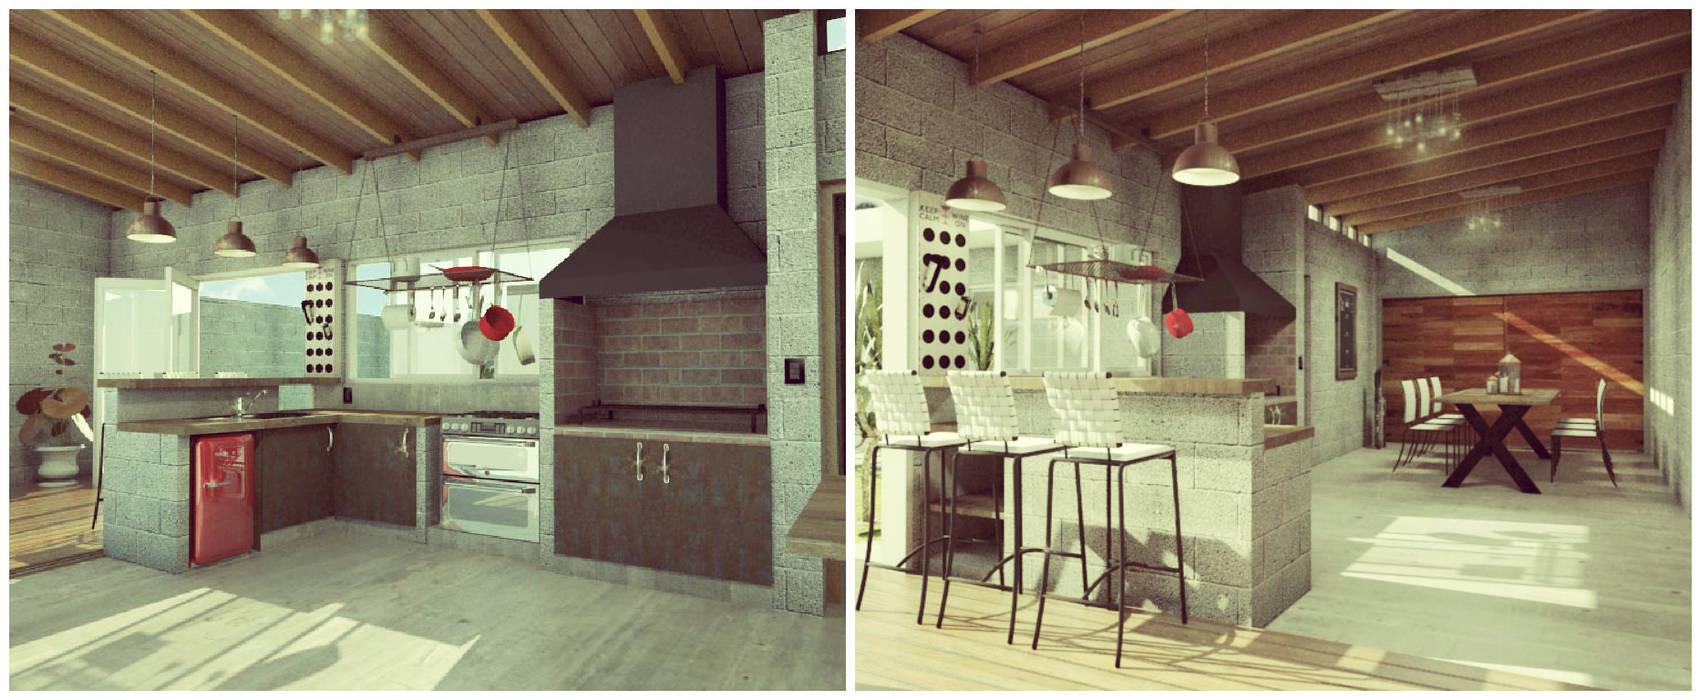 Quincho / Garage: Comedores de estilo moderno por VI Arquitectura & Dis. Interior